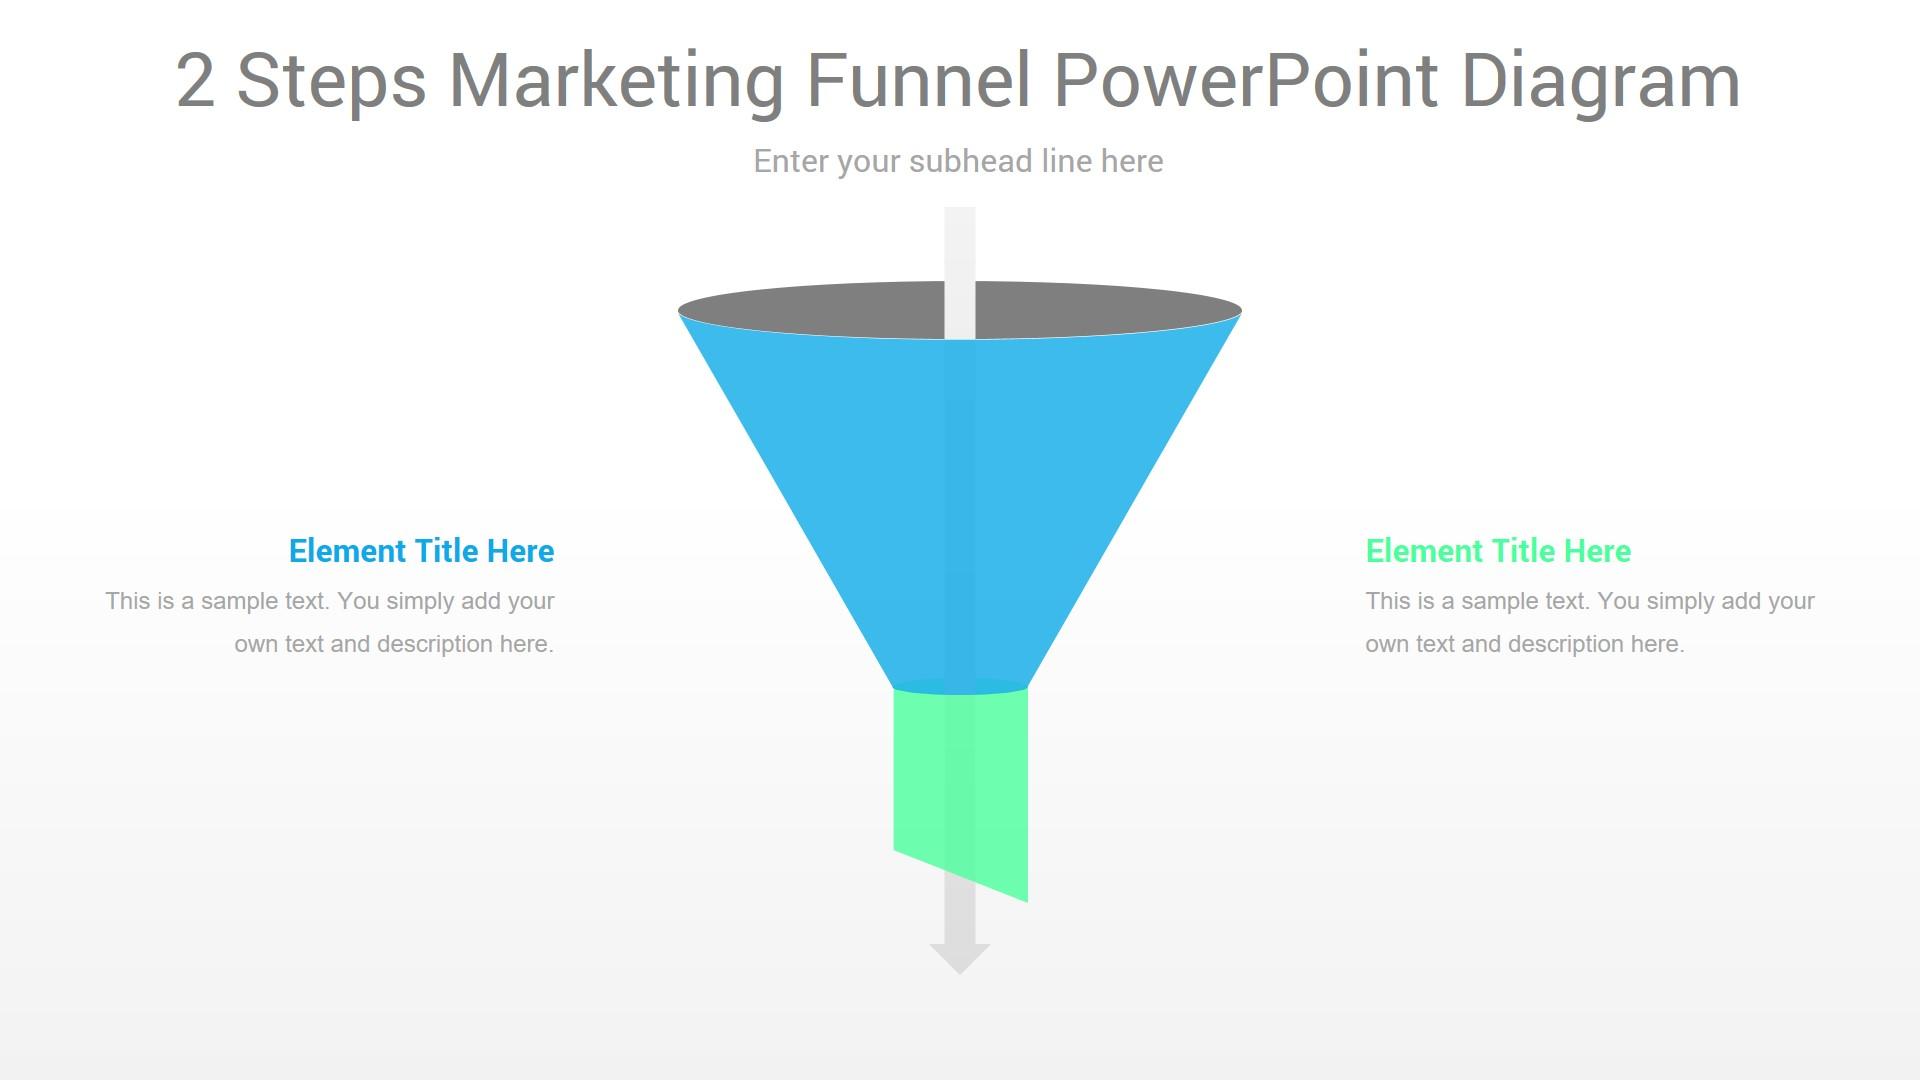 2 Steps Marketing Funnel PowerPoint Diagram